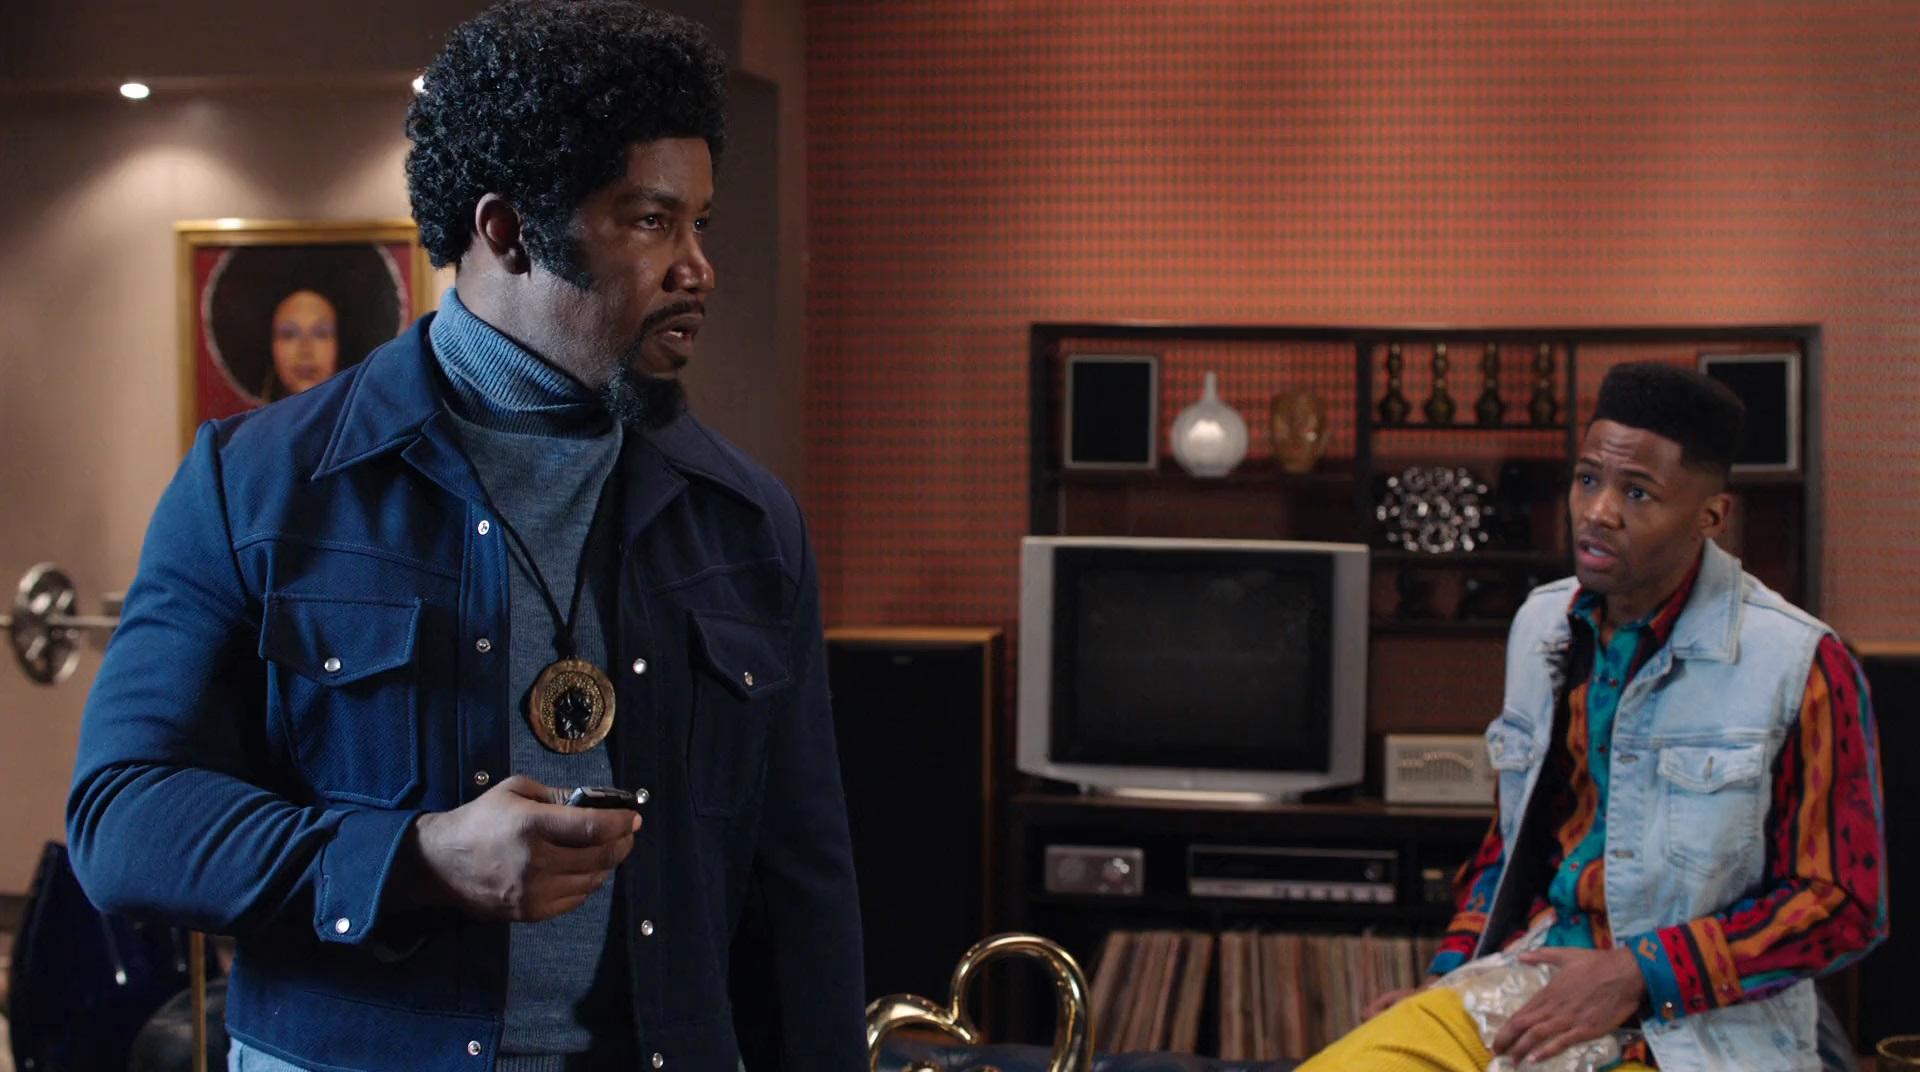 Çılgın Kahraman 2   Undercover Brother 2   2019   BDRip   XviD   Türkçe Dublaj   1080p - m720p - m1080p   BluRay   Dual   TR-EN   Tek Link